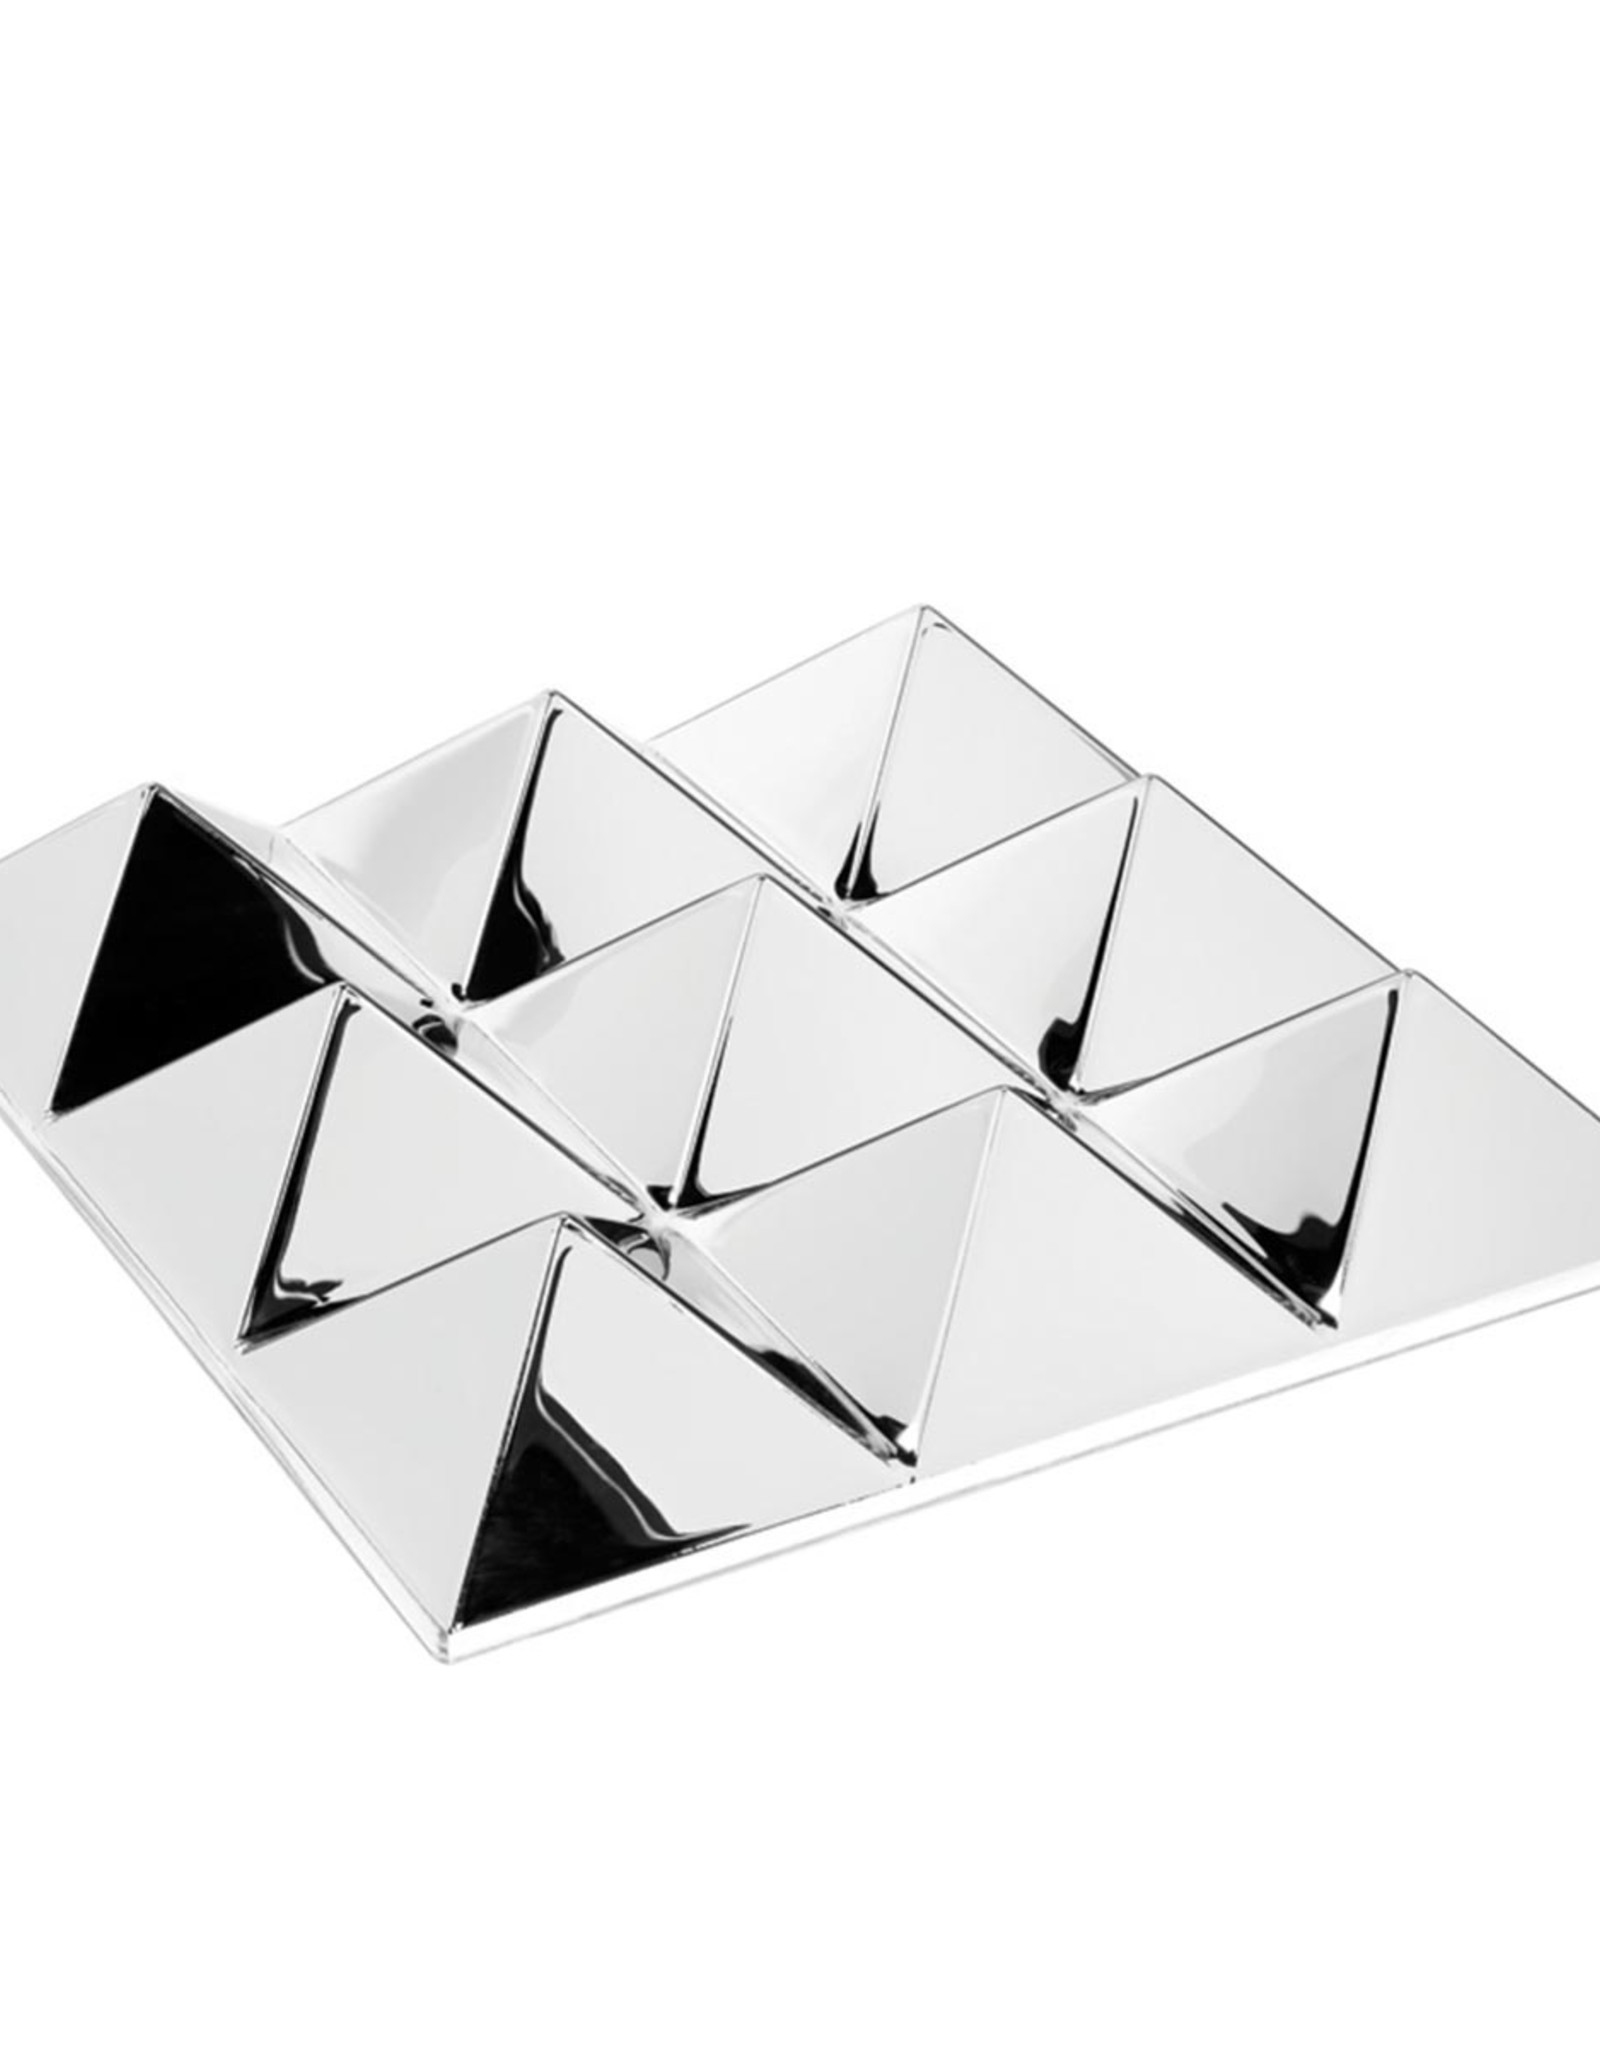 Mirror sculptures by Verner Panton | 9 pyramides